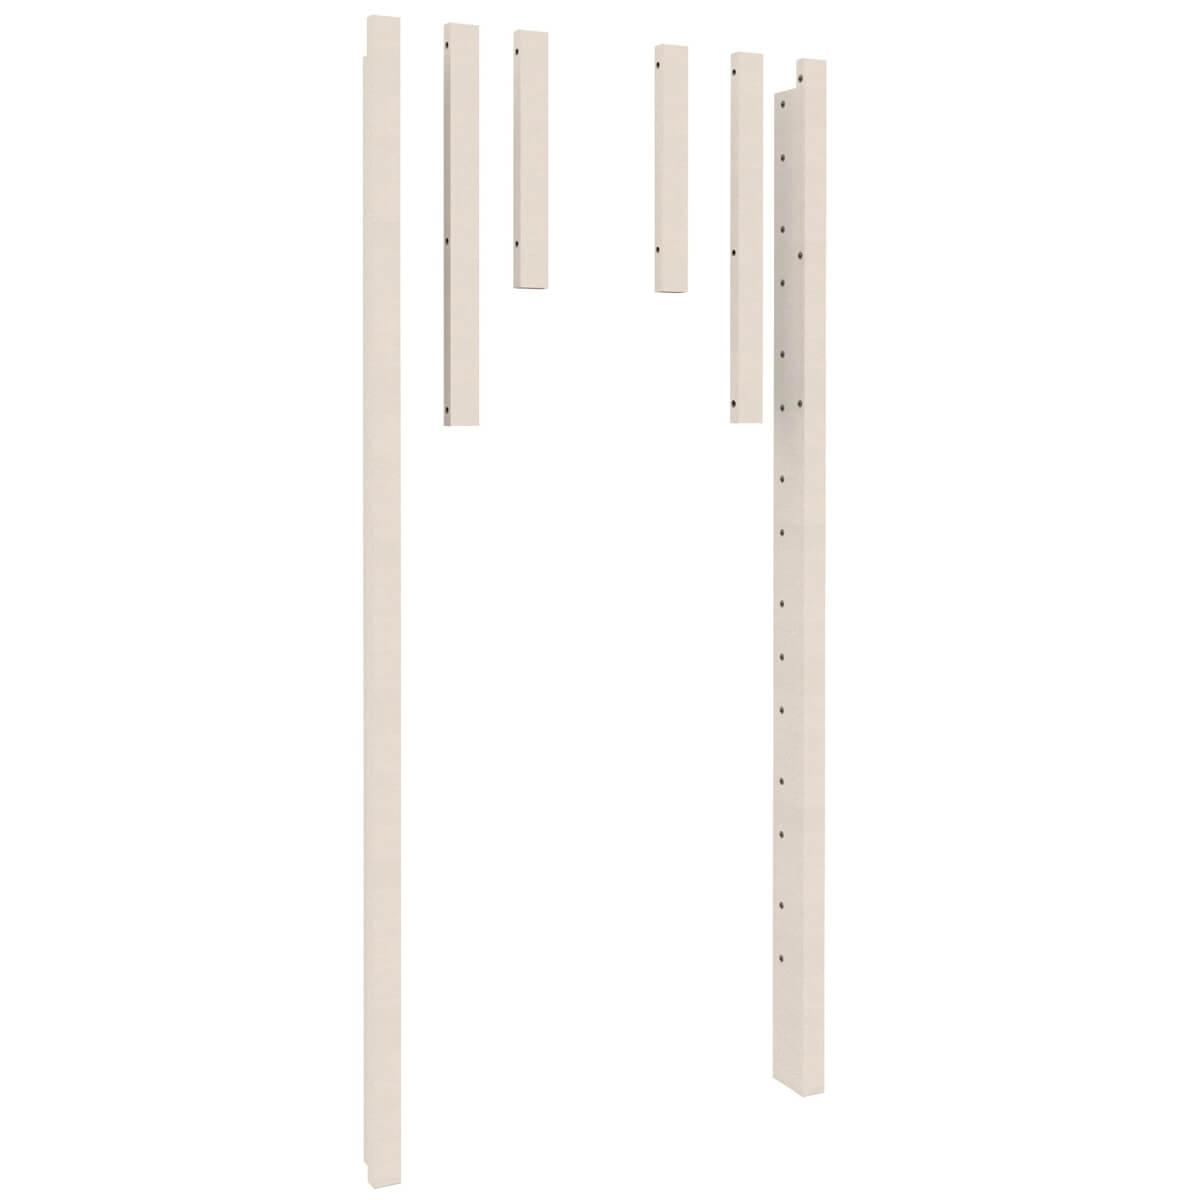 Eckpfosten Twin-over-Full  2-er Set DESTYLE de Breuyn Buche massiv weiß gebeizt-lackiert